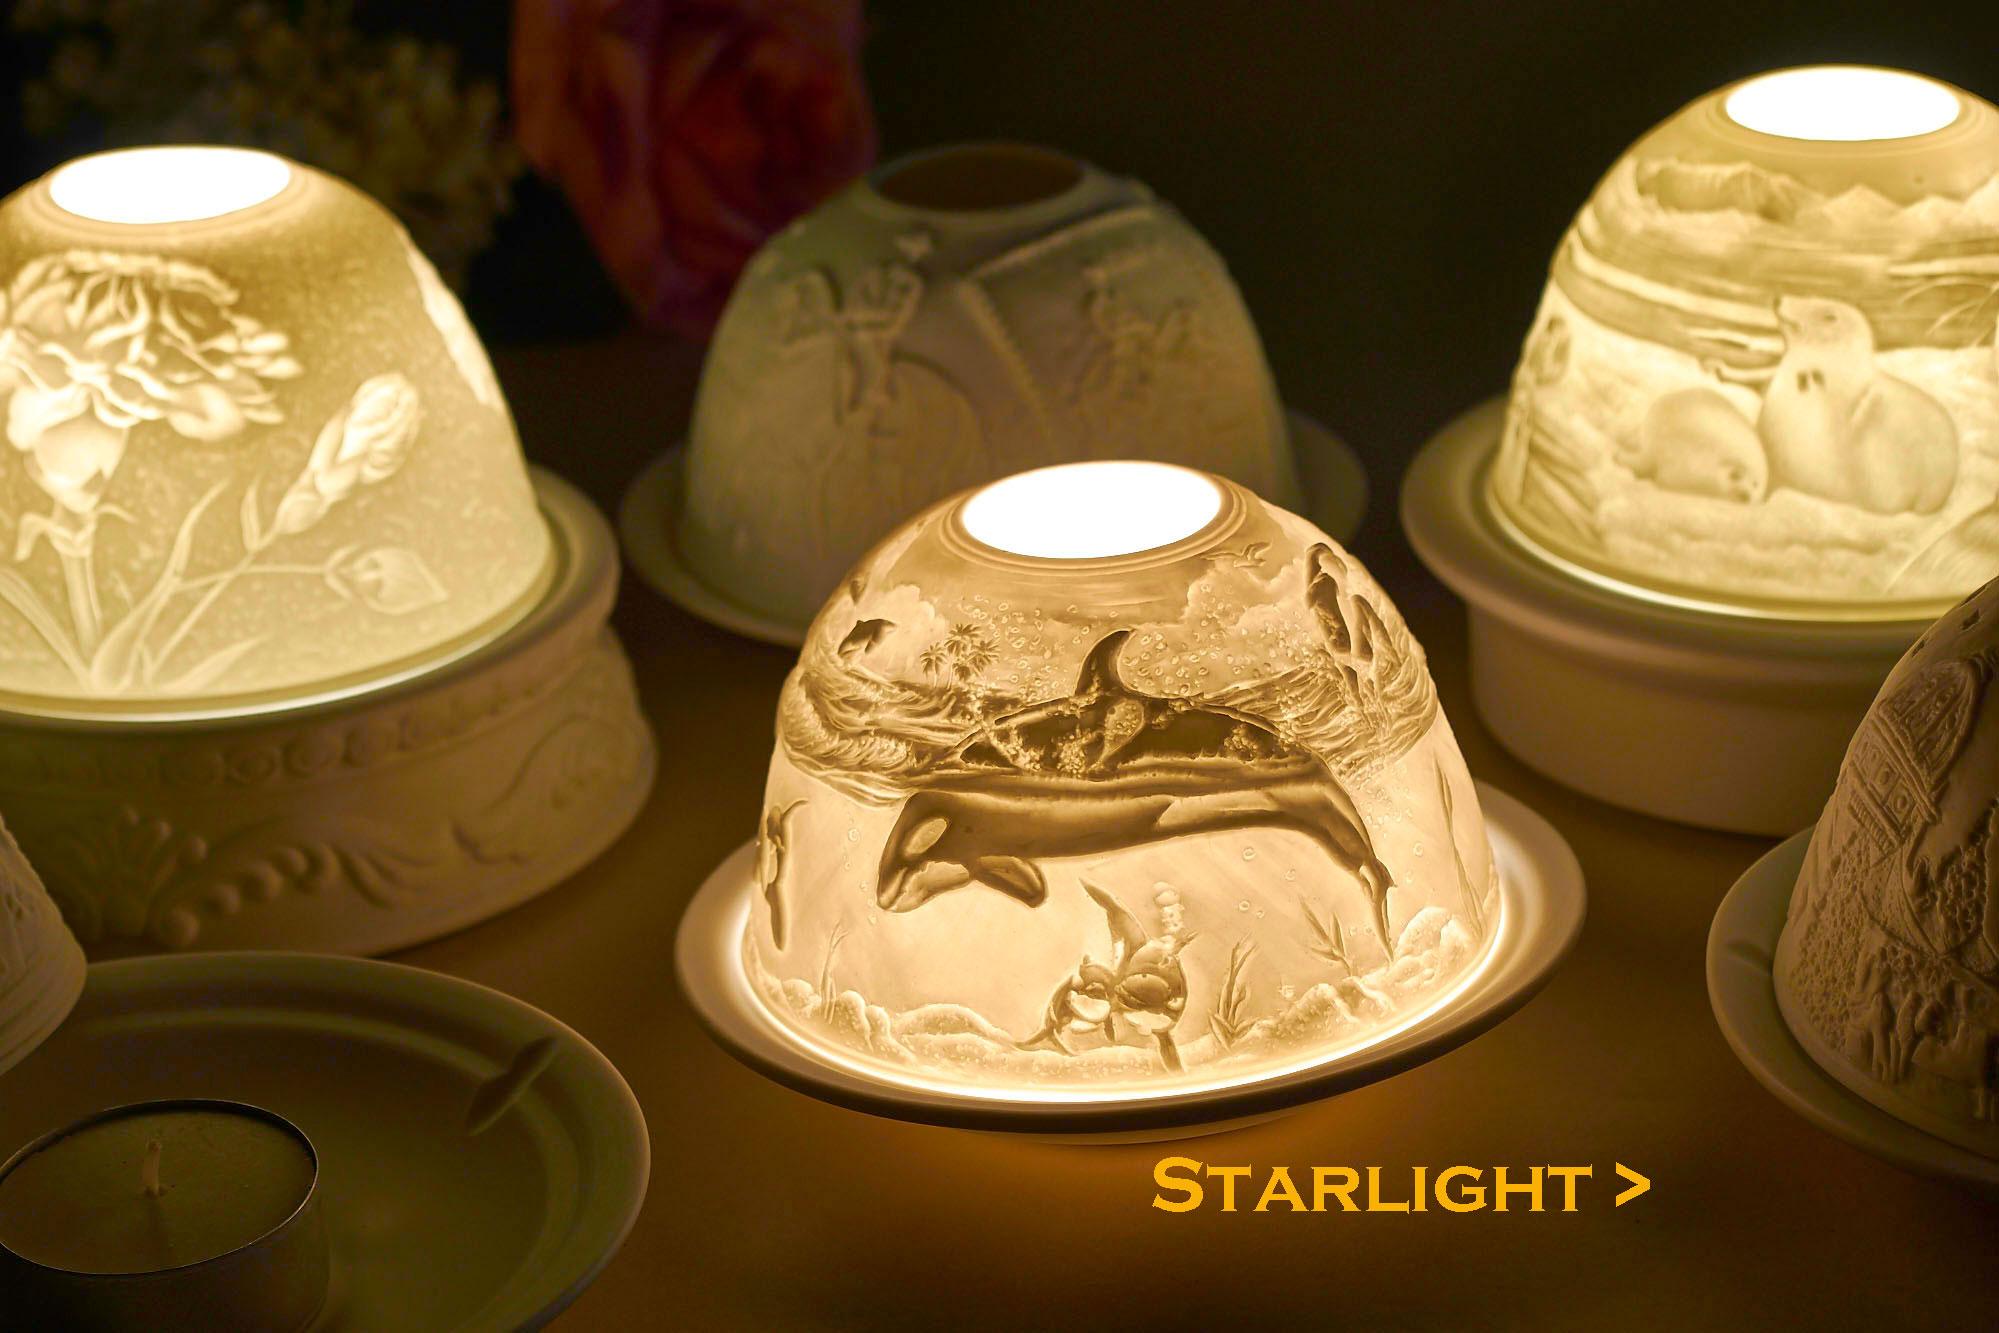 hellmann versand starlight porzellan teelichthalter